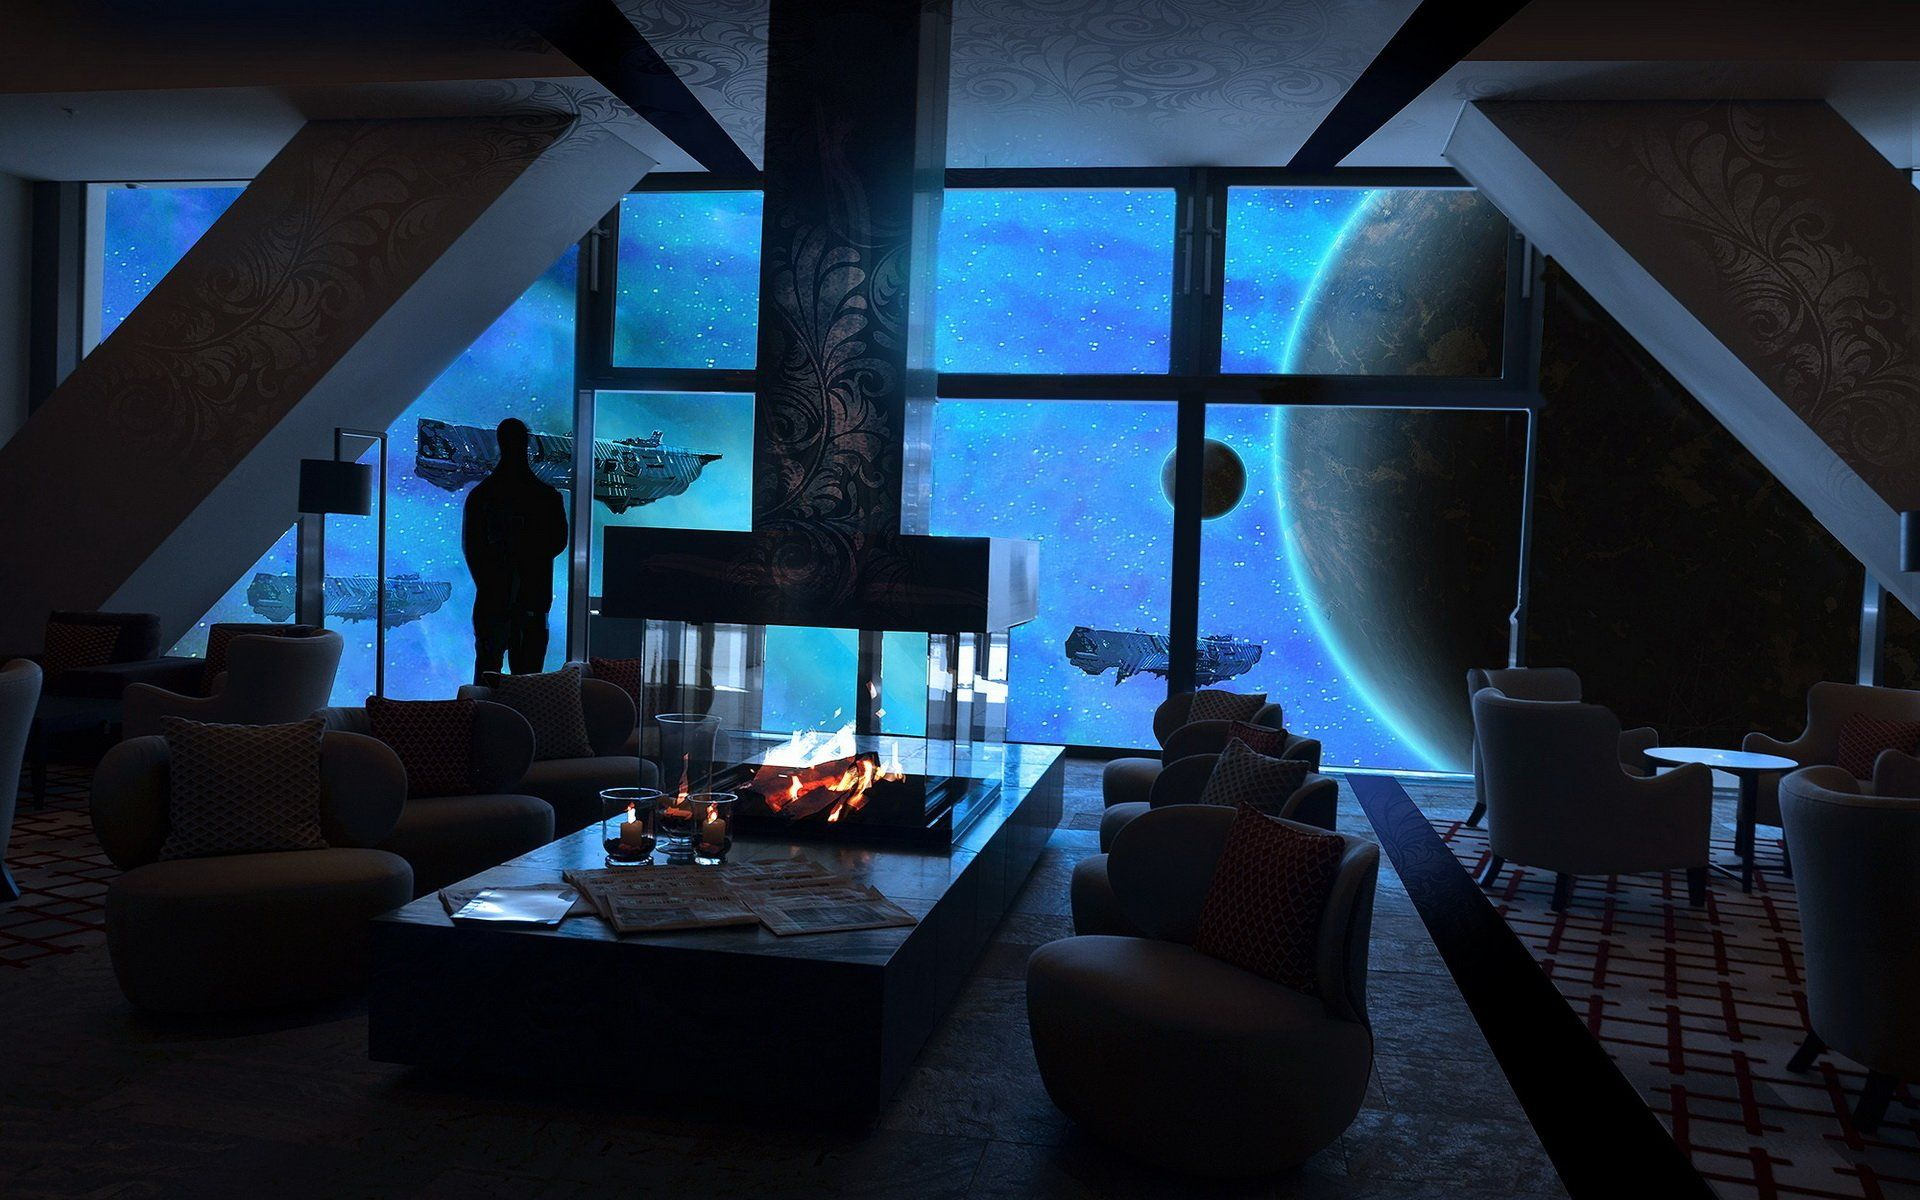 Sci Fi Space Station Wallpaper Apartment Wallpaper Space Interior Design Futuristic Cities